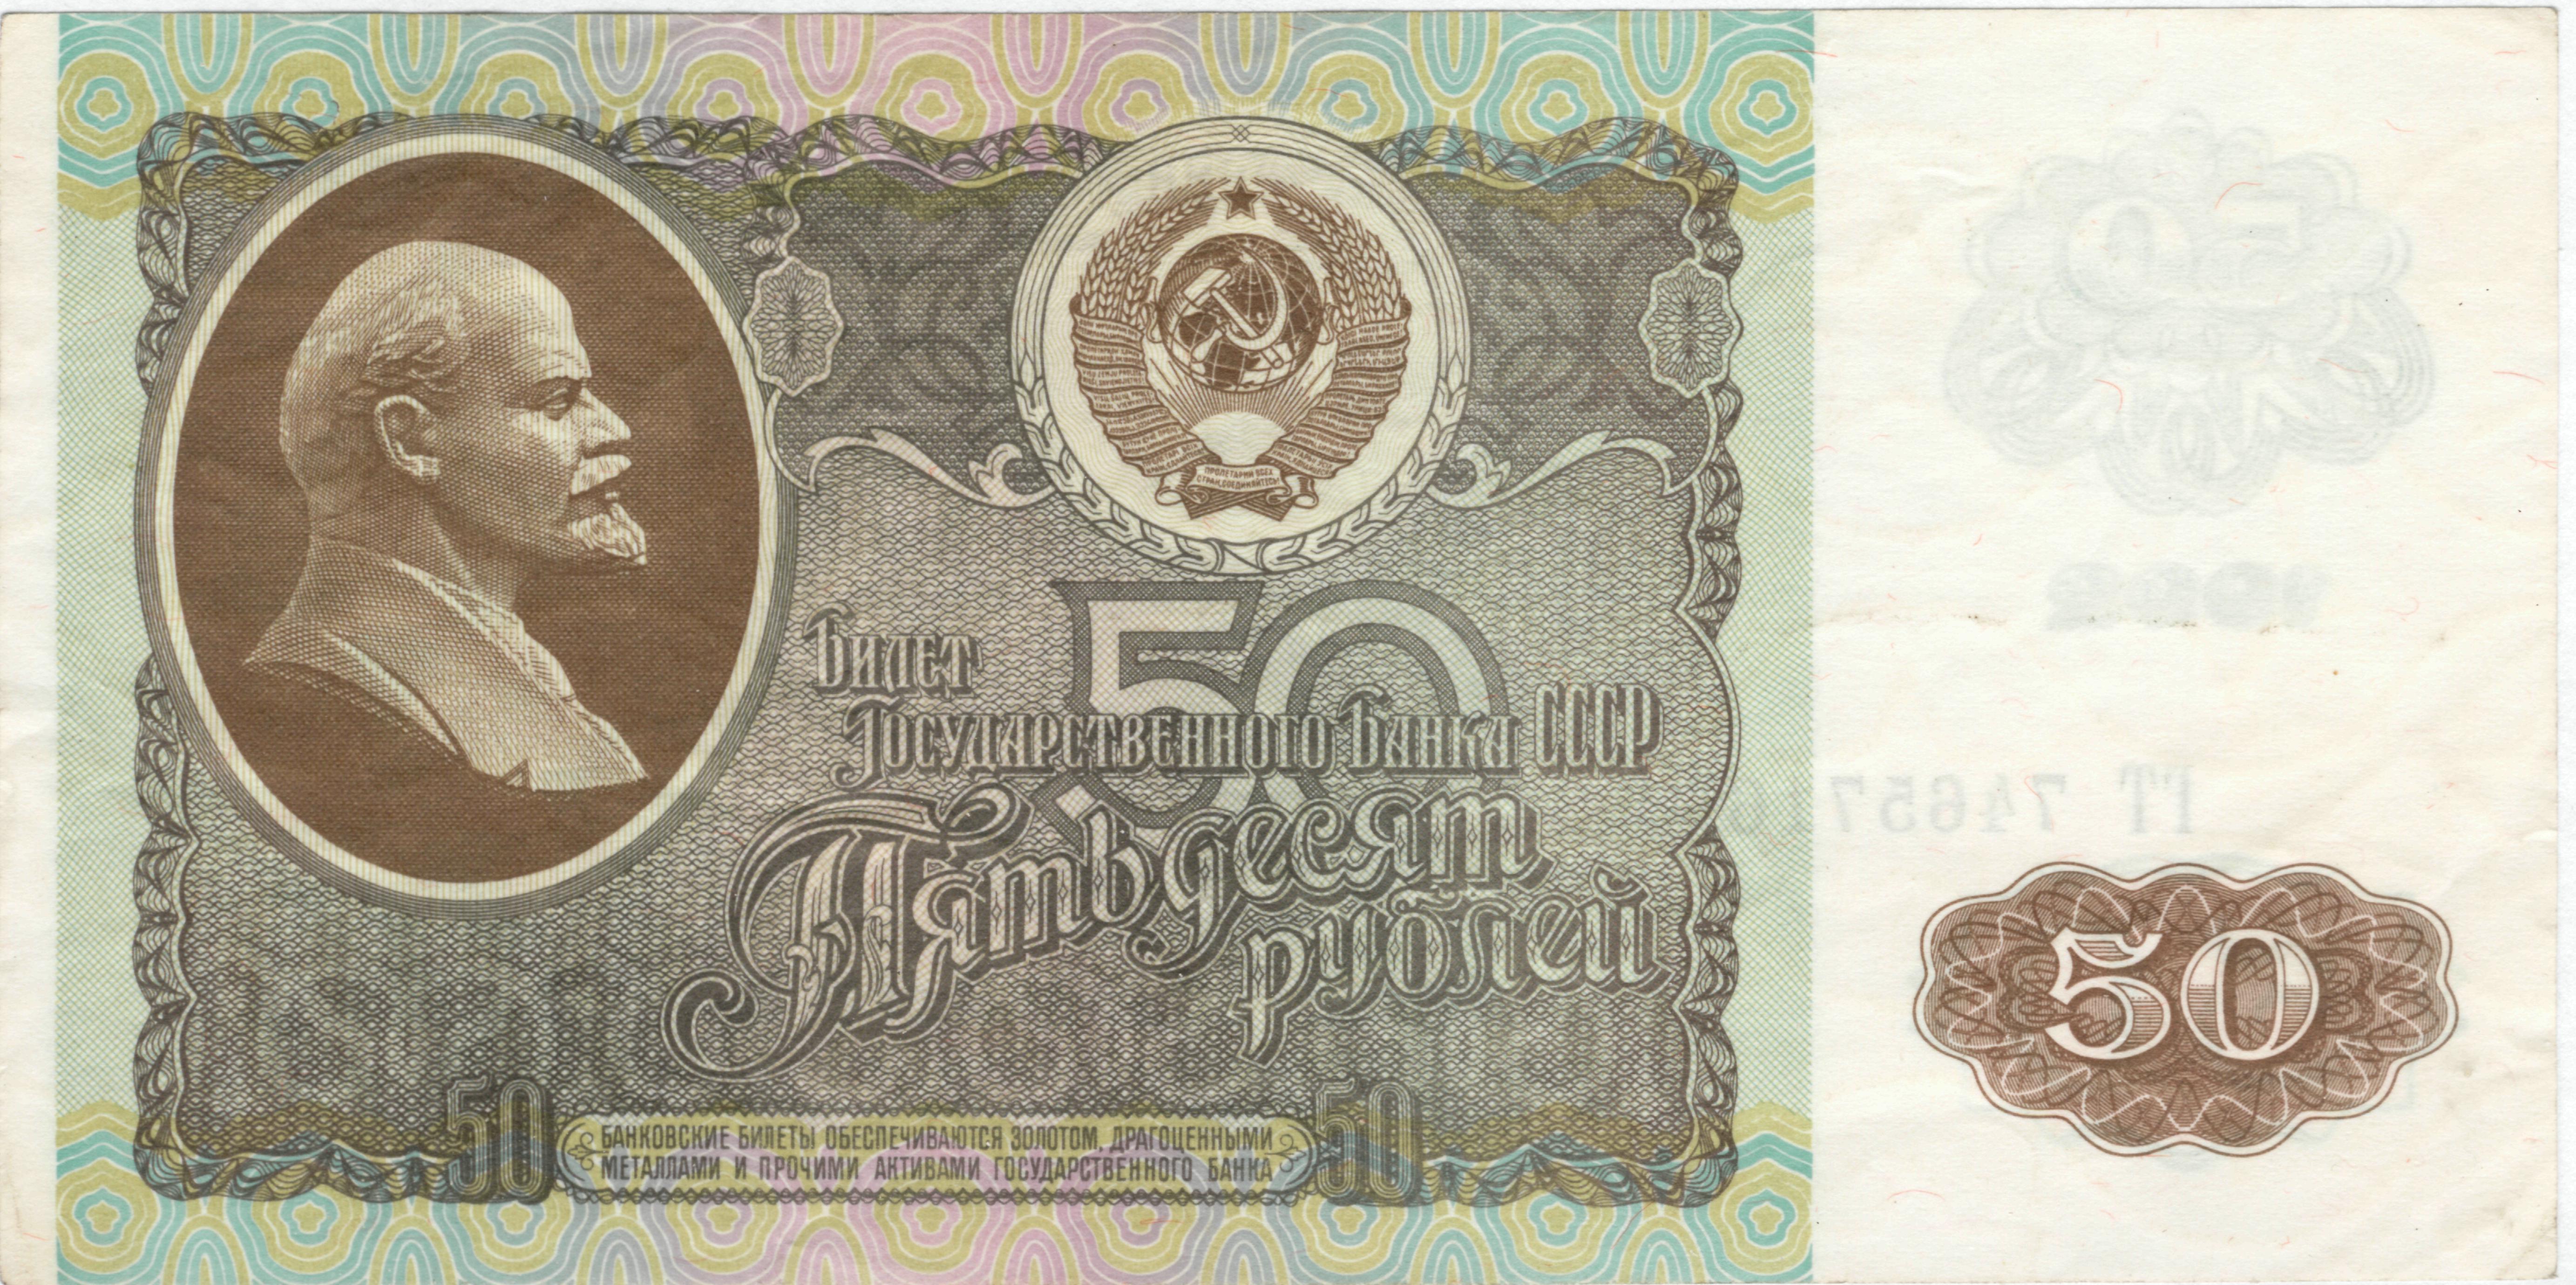 File:50 рублей СССР 1992 г. Аверс.jpg - Wikimedia Commons